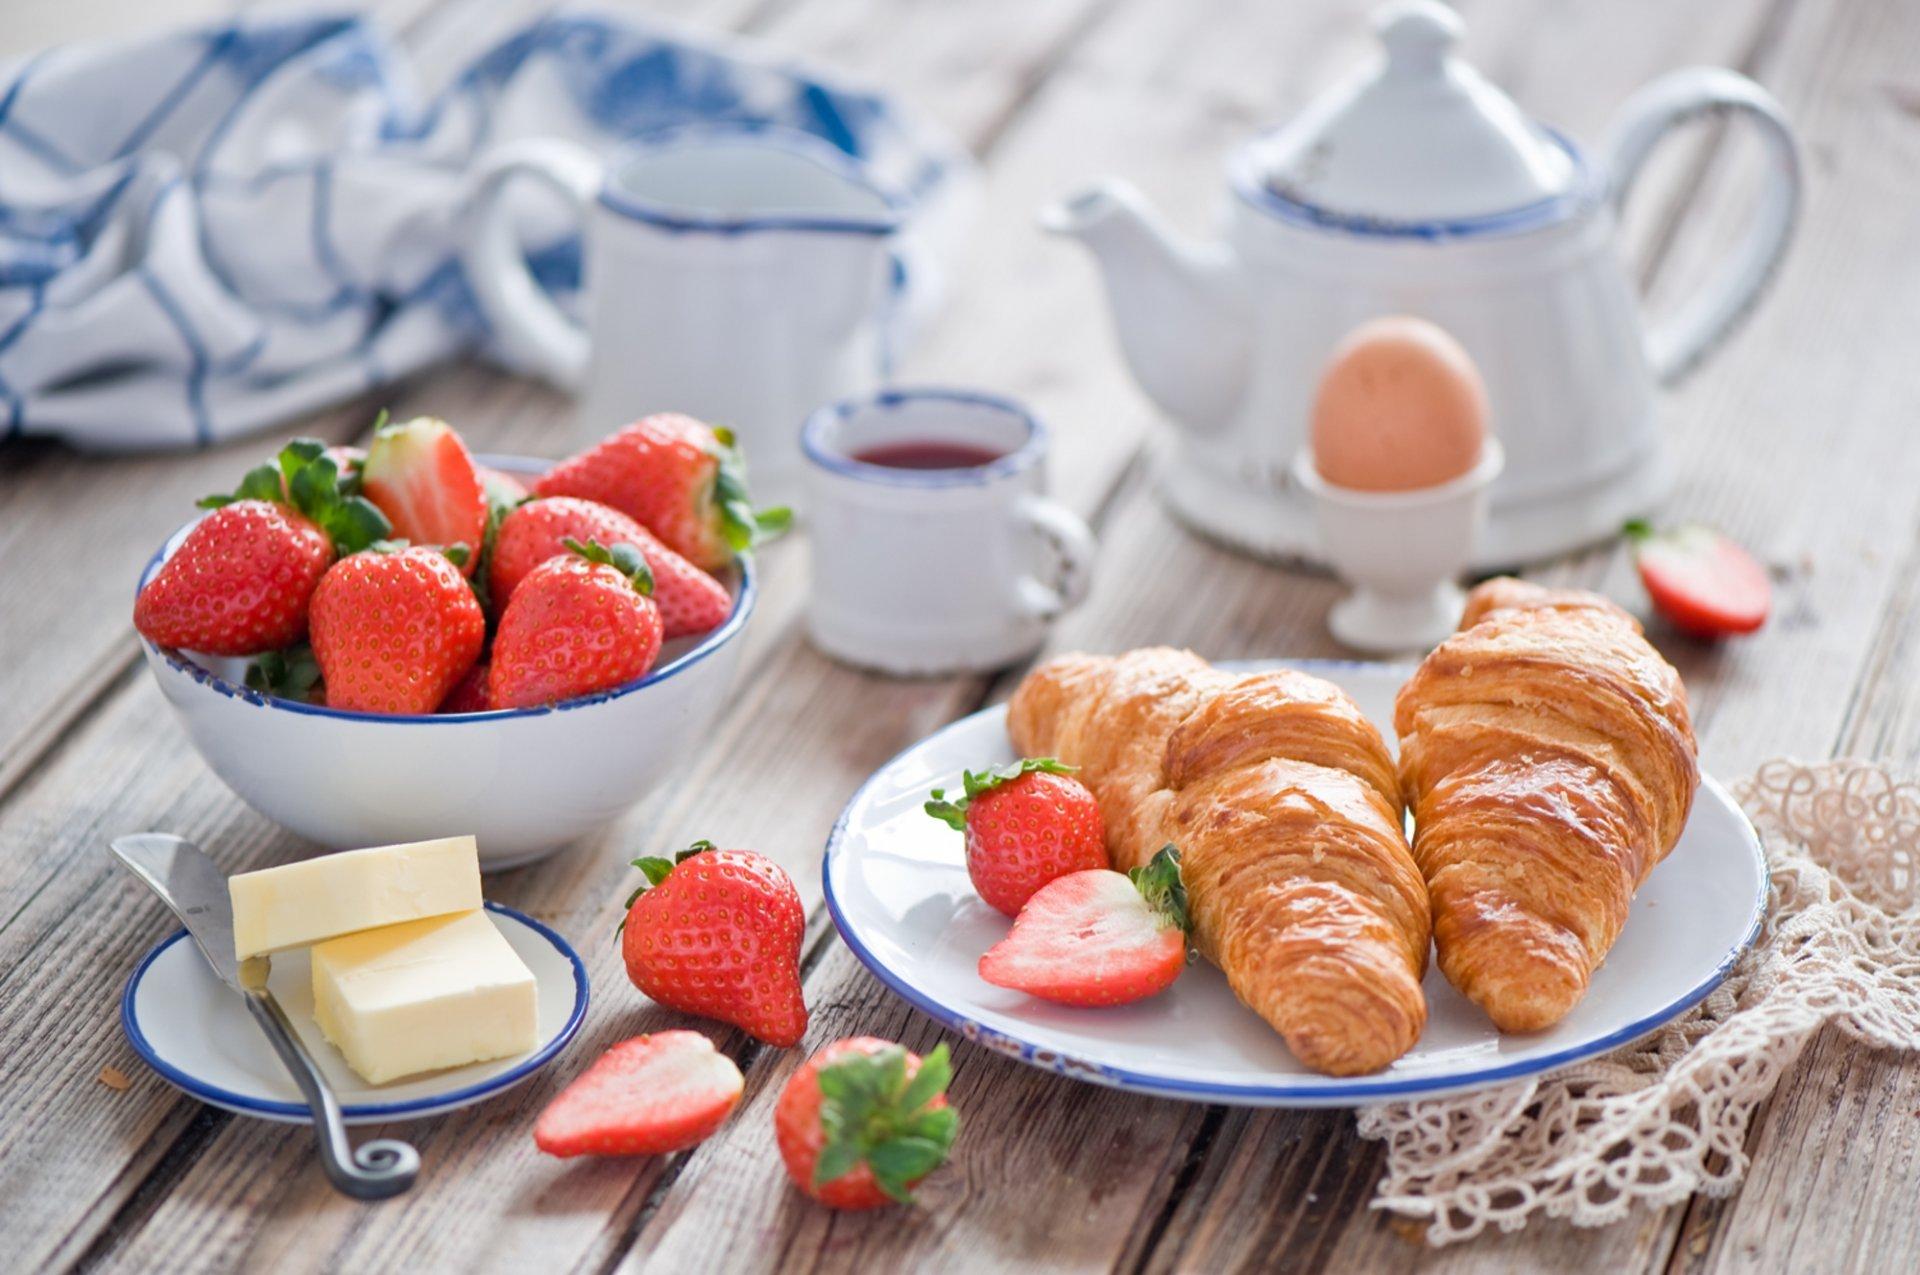 food-sweet-fruit-strawberry-food-sweet-fruits-strawberry-croissant-drink-tea-croissant-tea